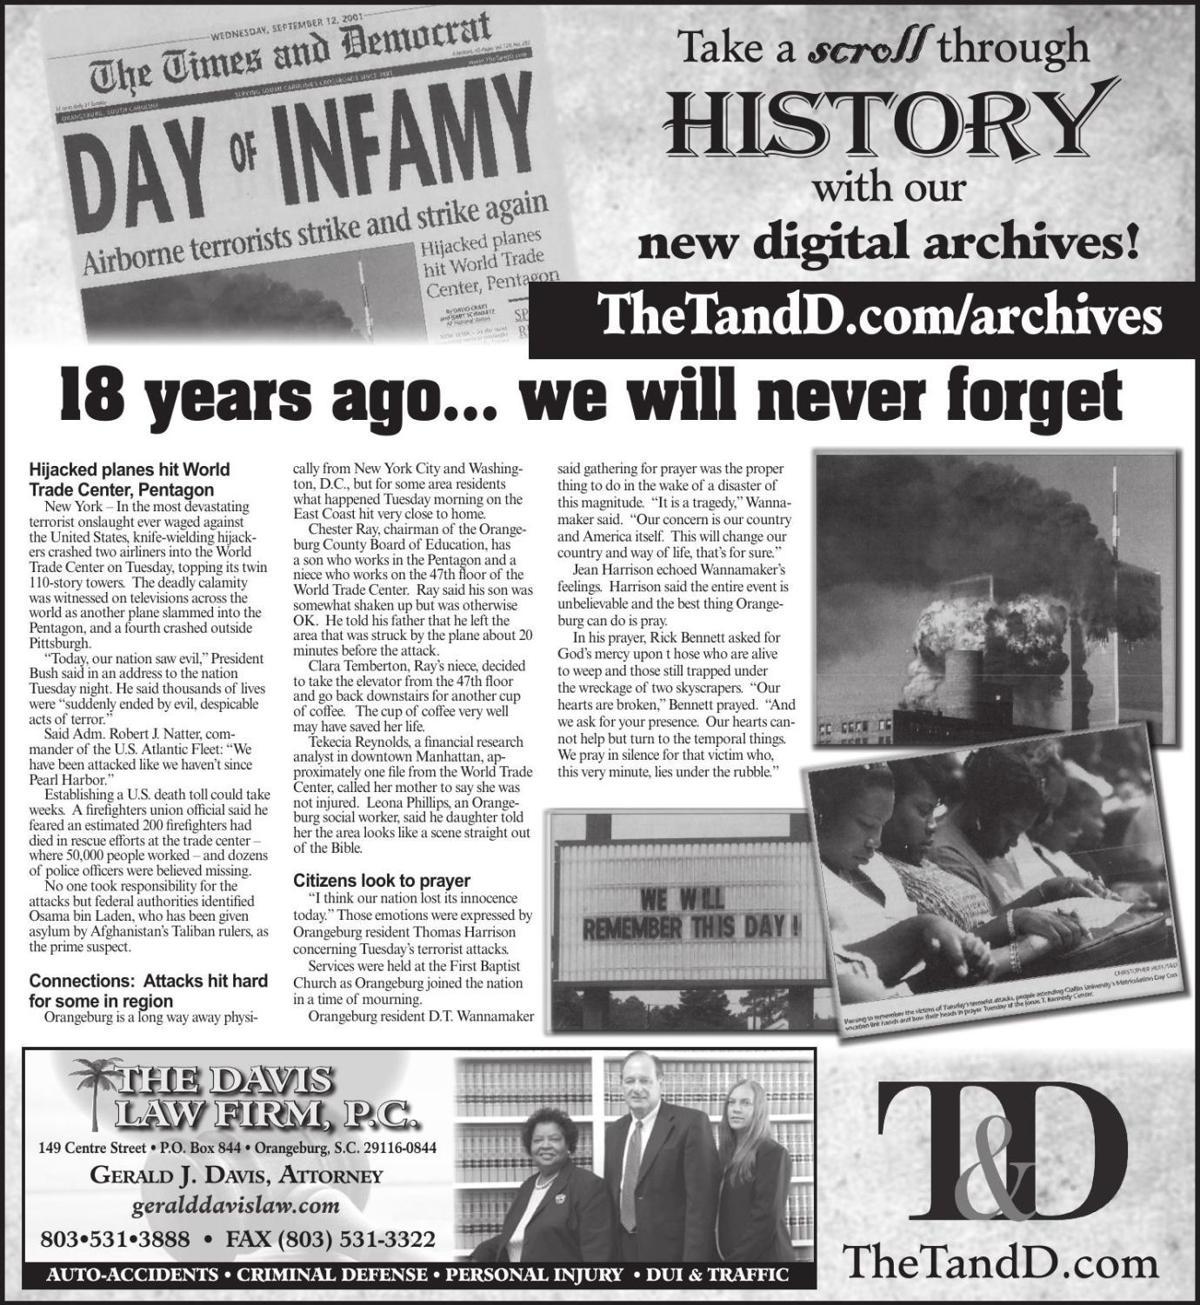 TheTandD.com/archives Sept. 8, 2019